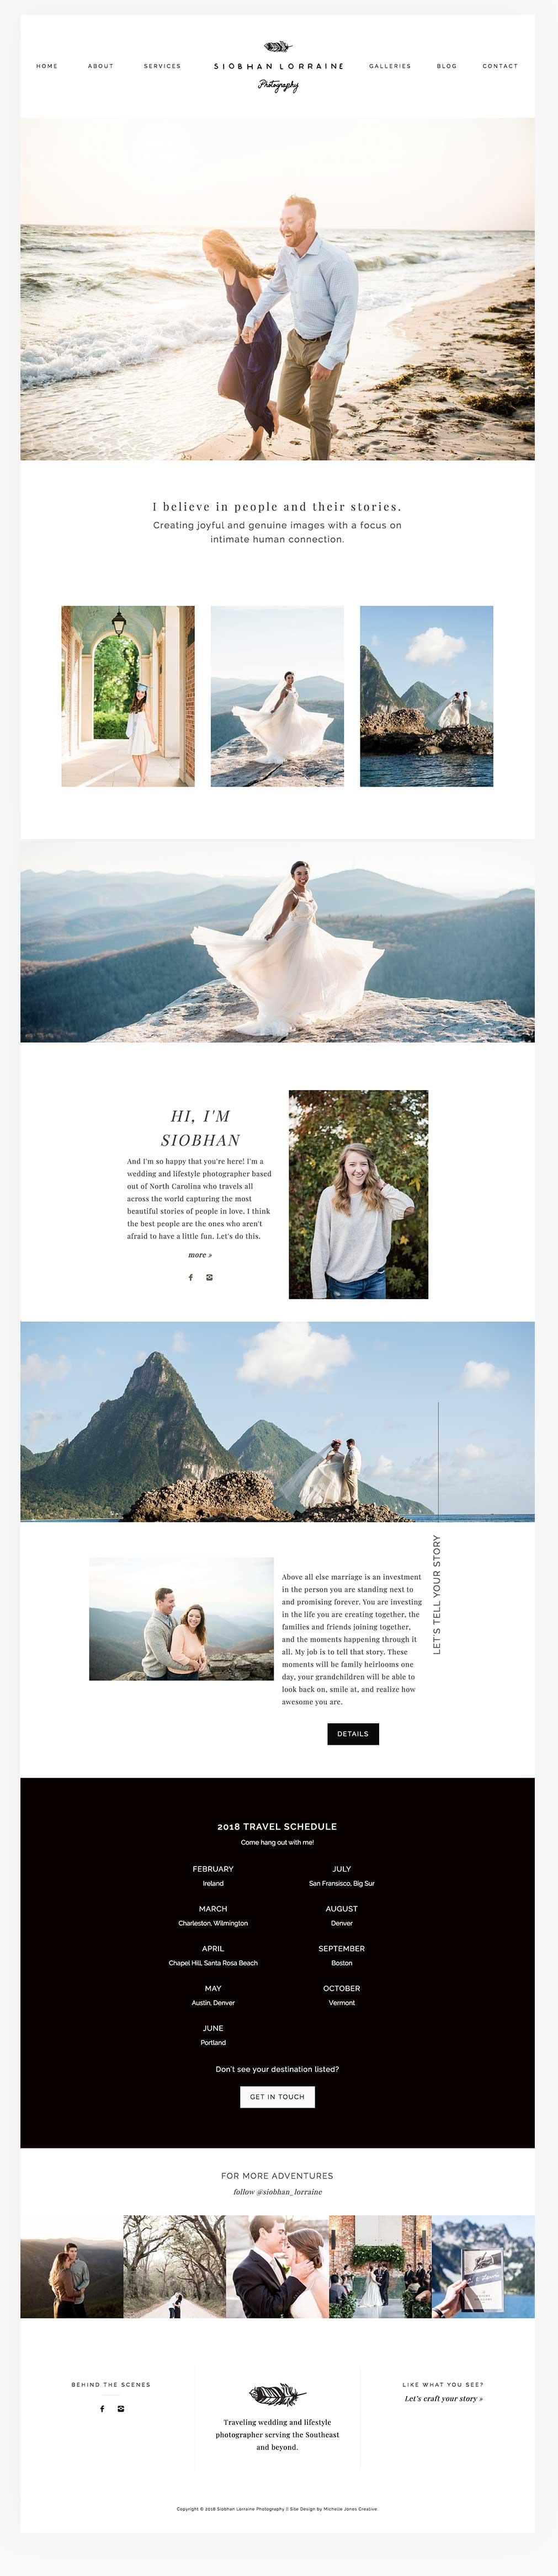 web-design-chapel-hill.jpg